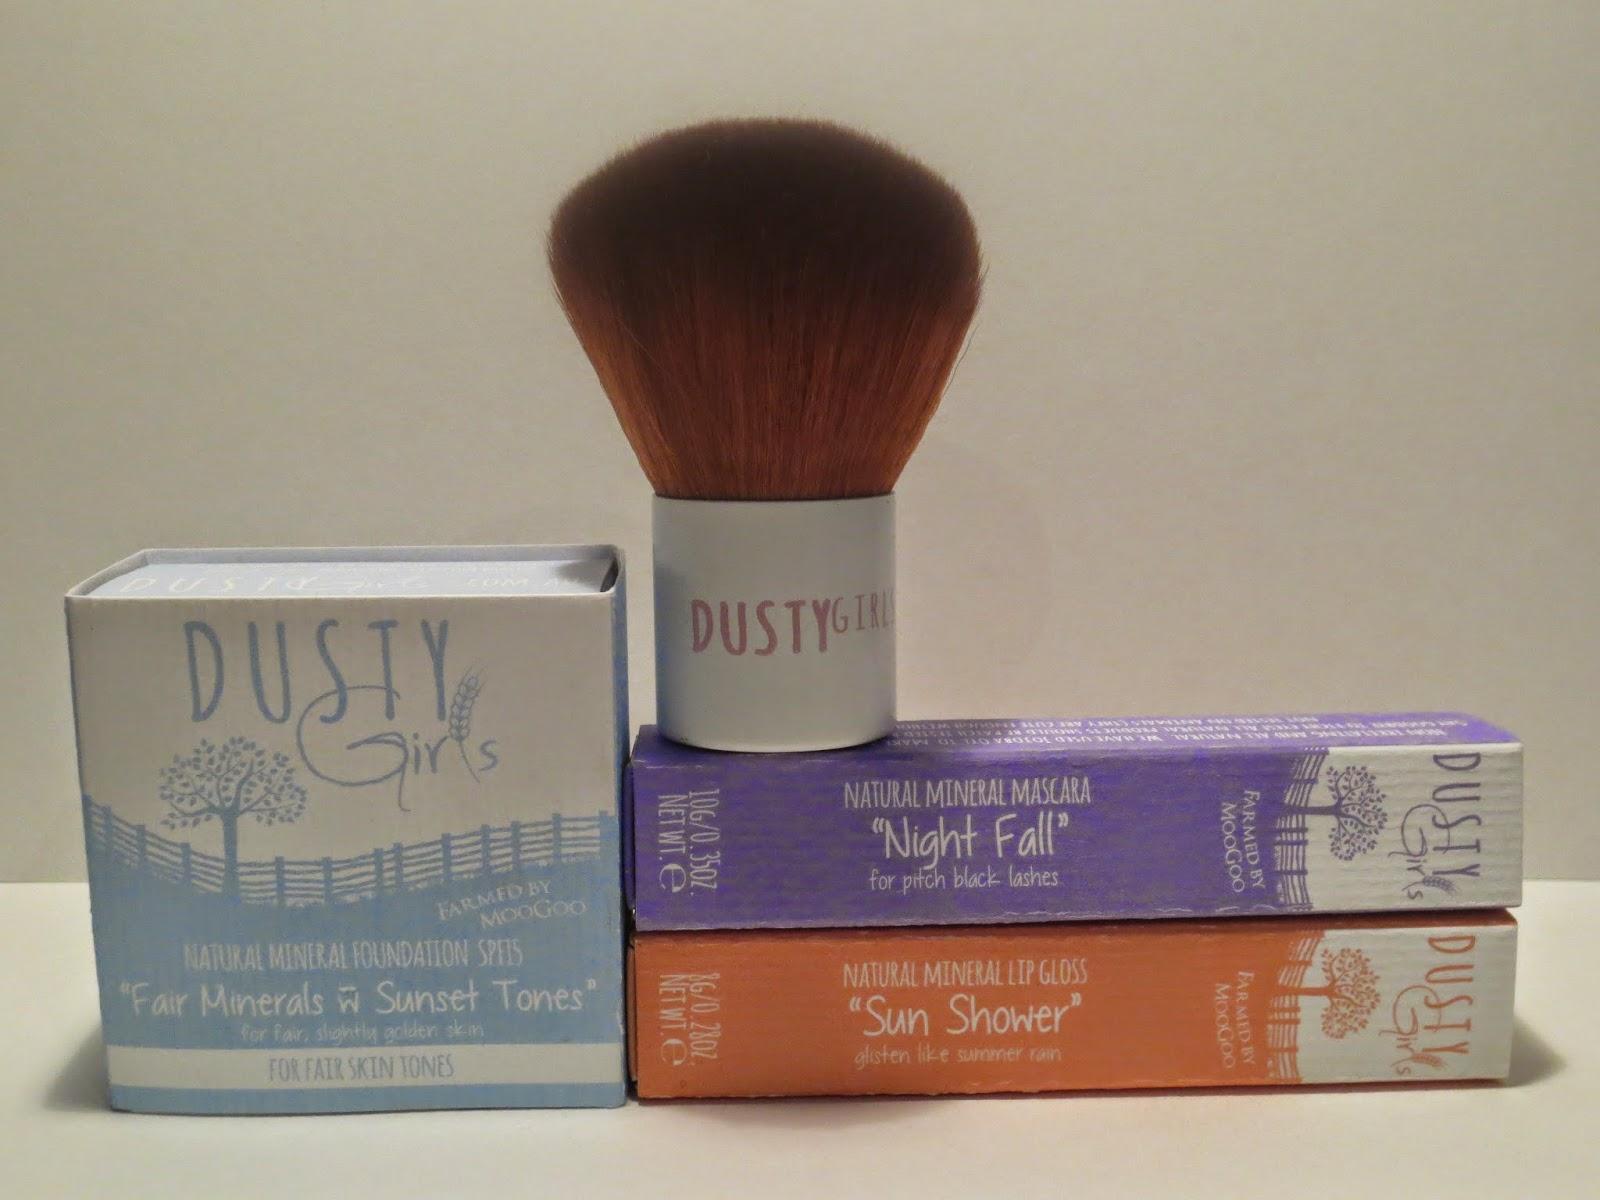 nail polish dusty girls natural mineral makeup review. Black Bedroom Furniture Sets. Home Design Ideas